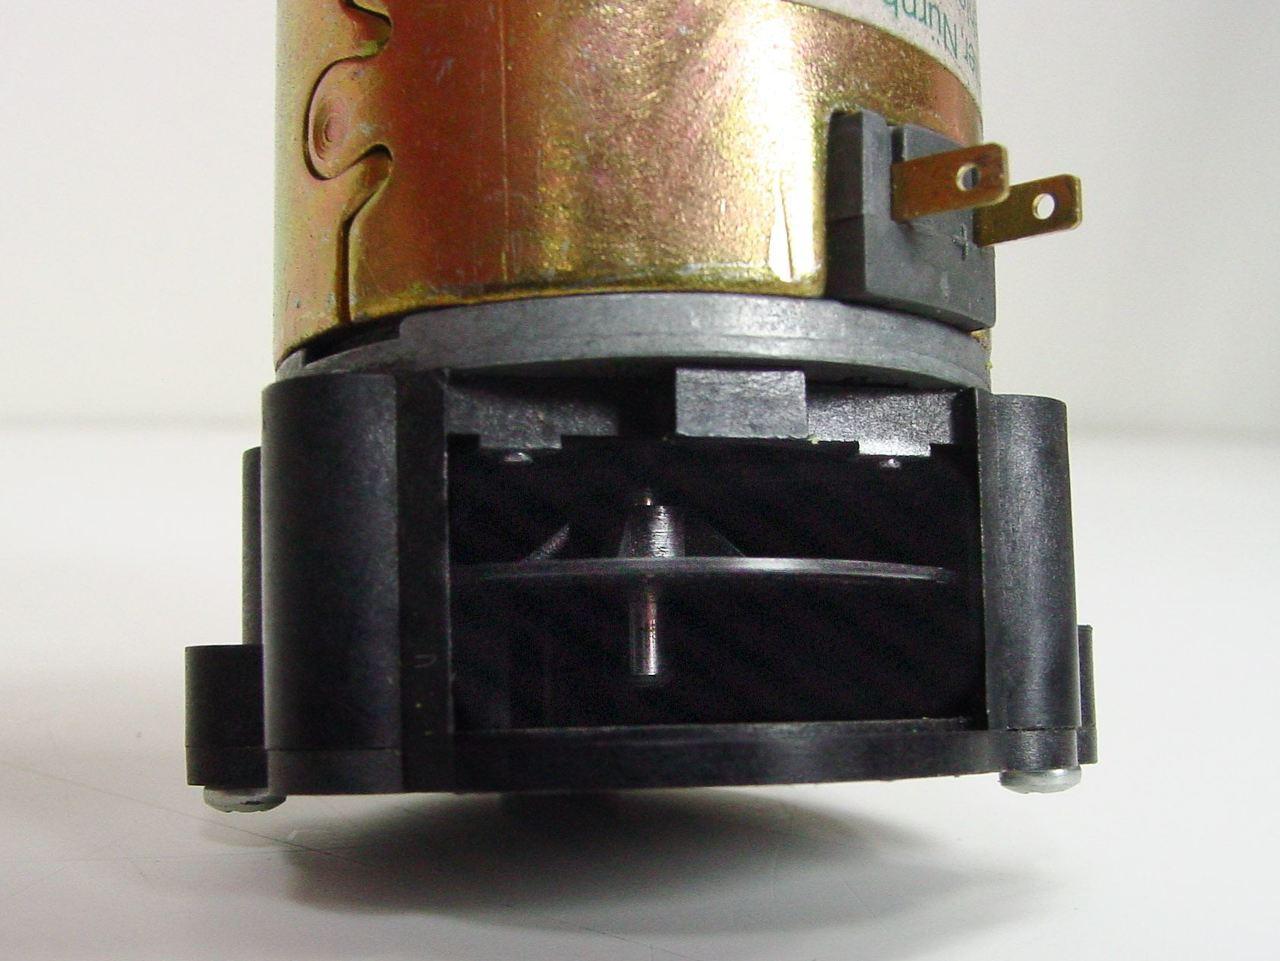 buhler 48 volt dc motor 1 13 043 107  [ 1280 x 961 Pixel ]